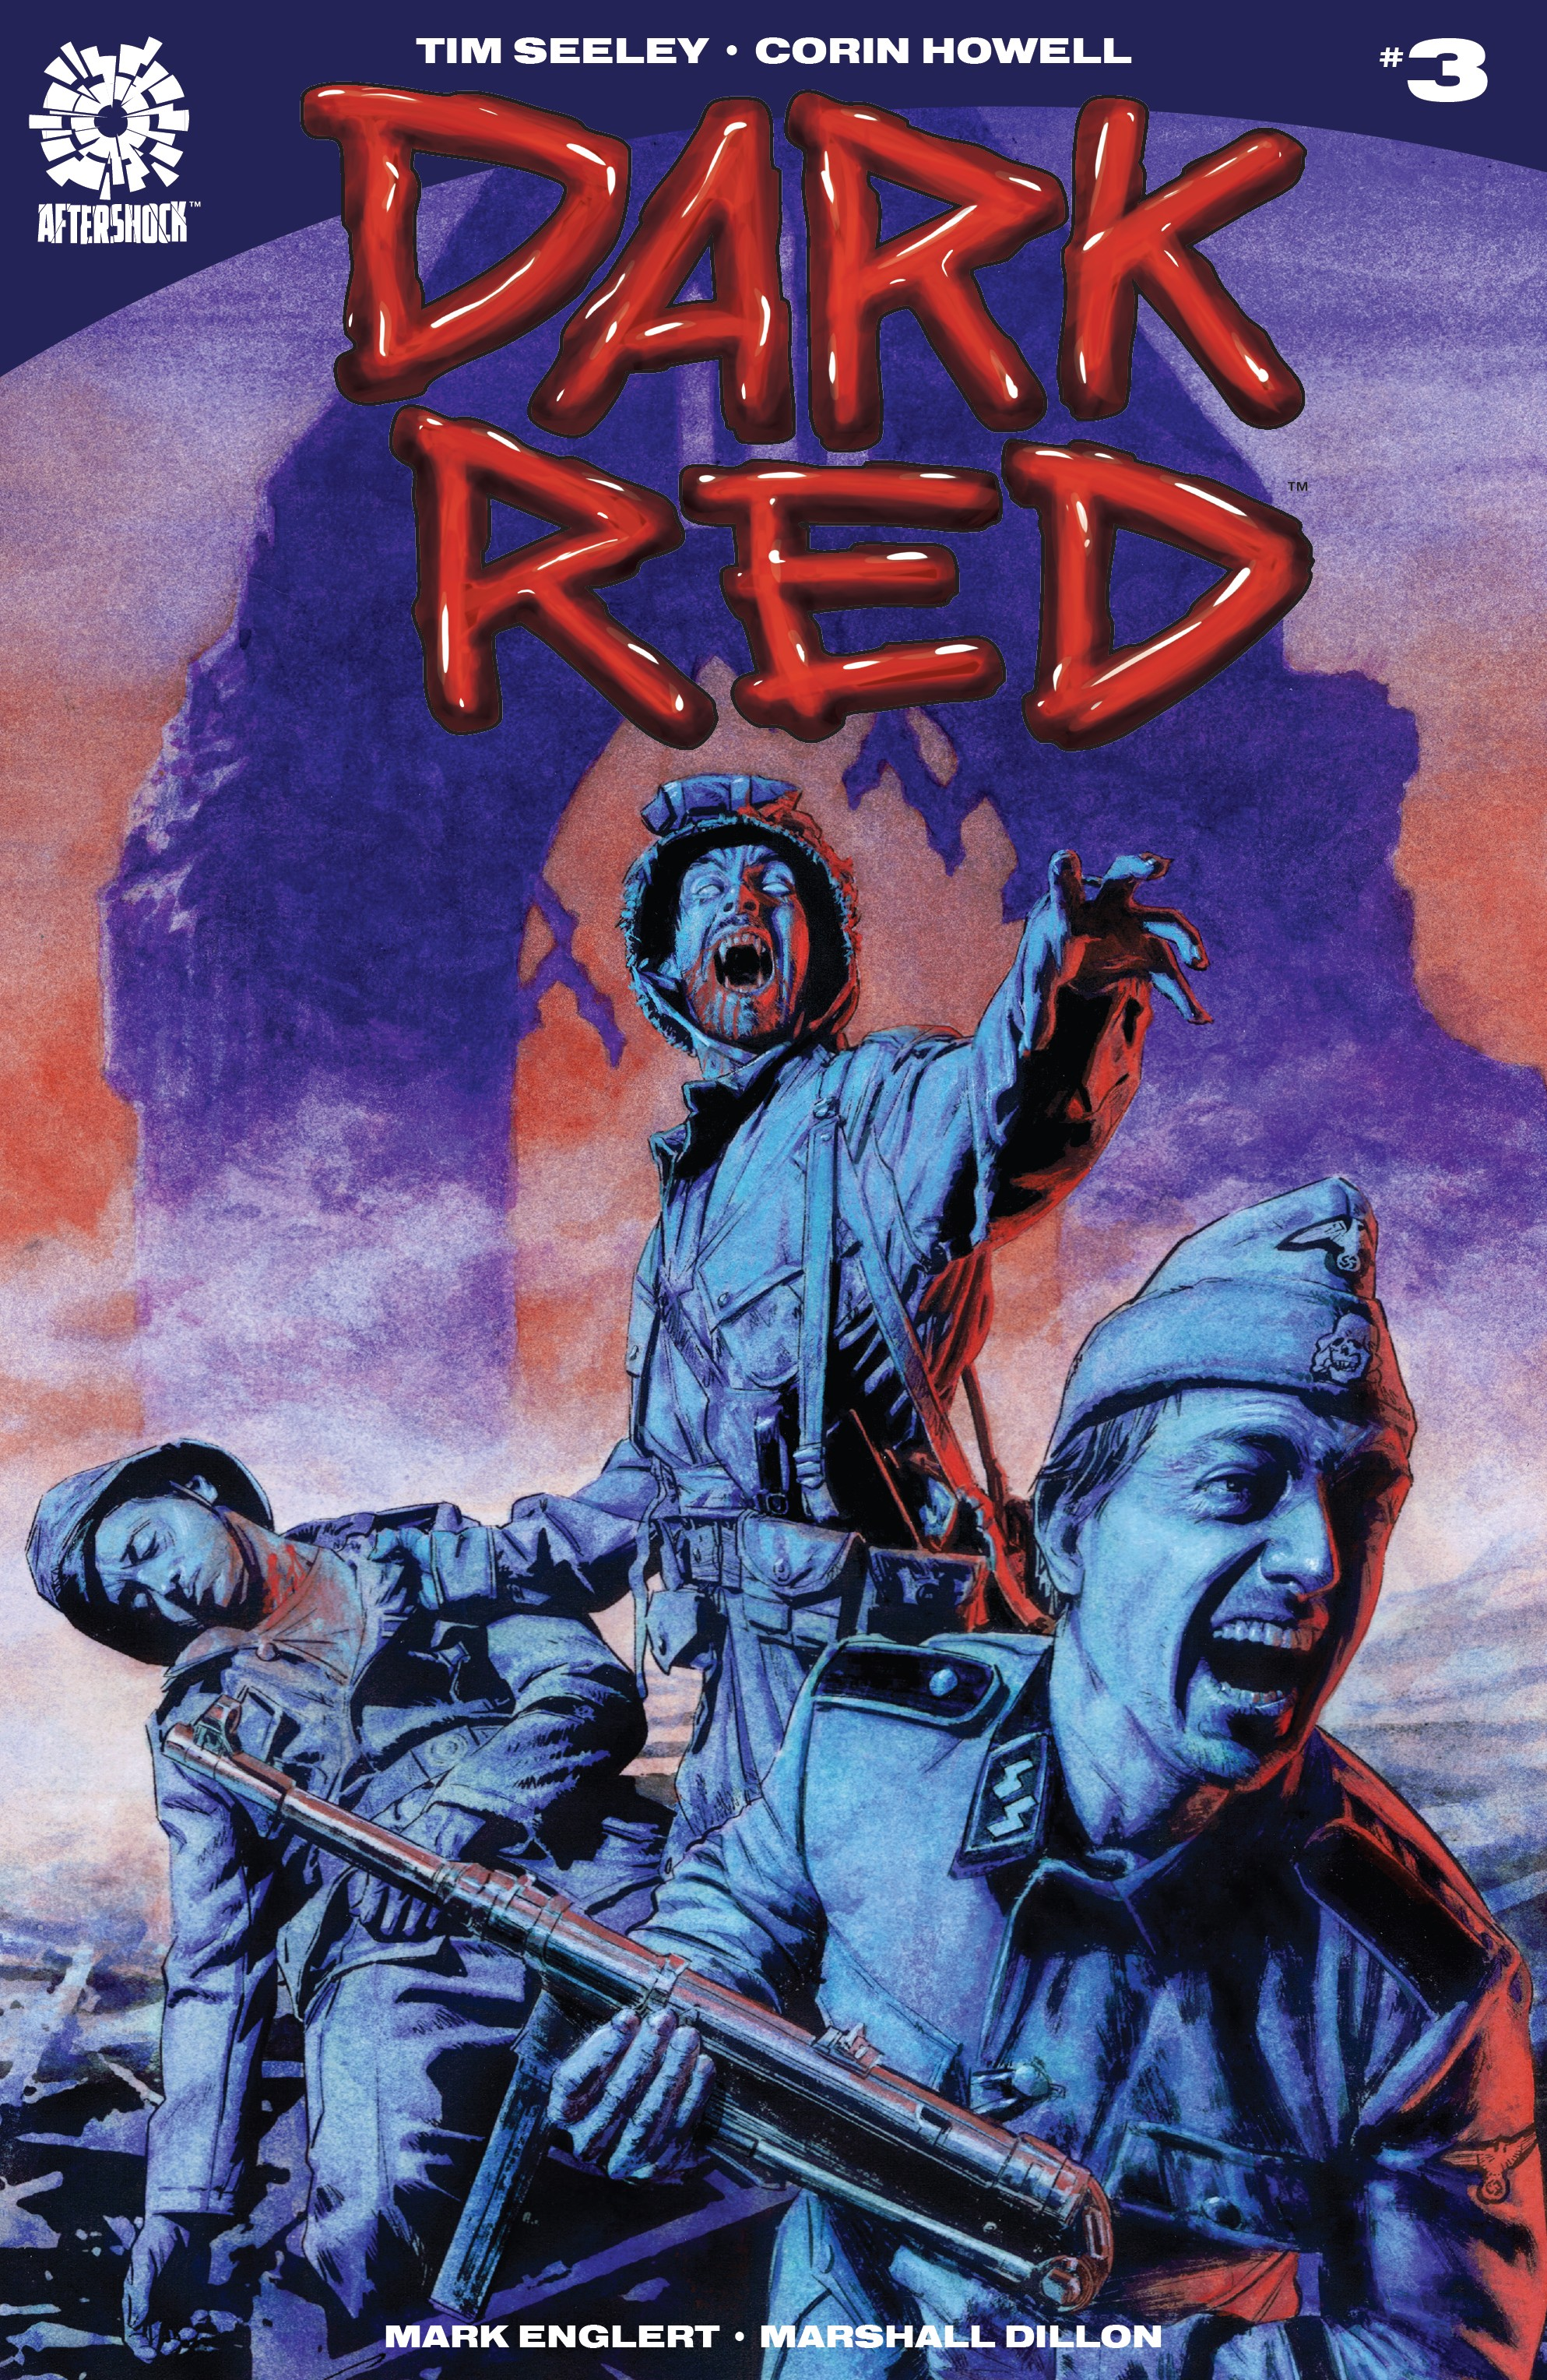 Dark Red #3, AfterShock